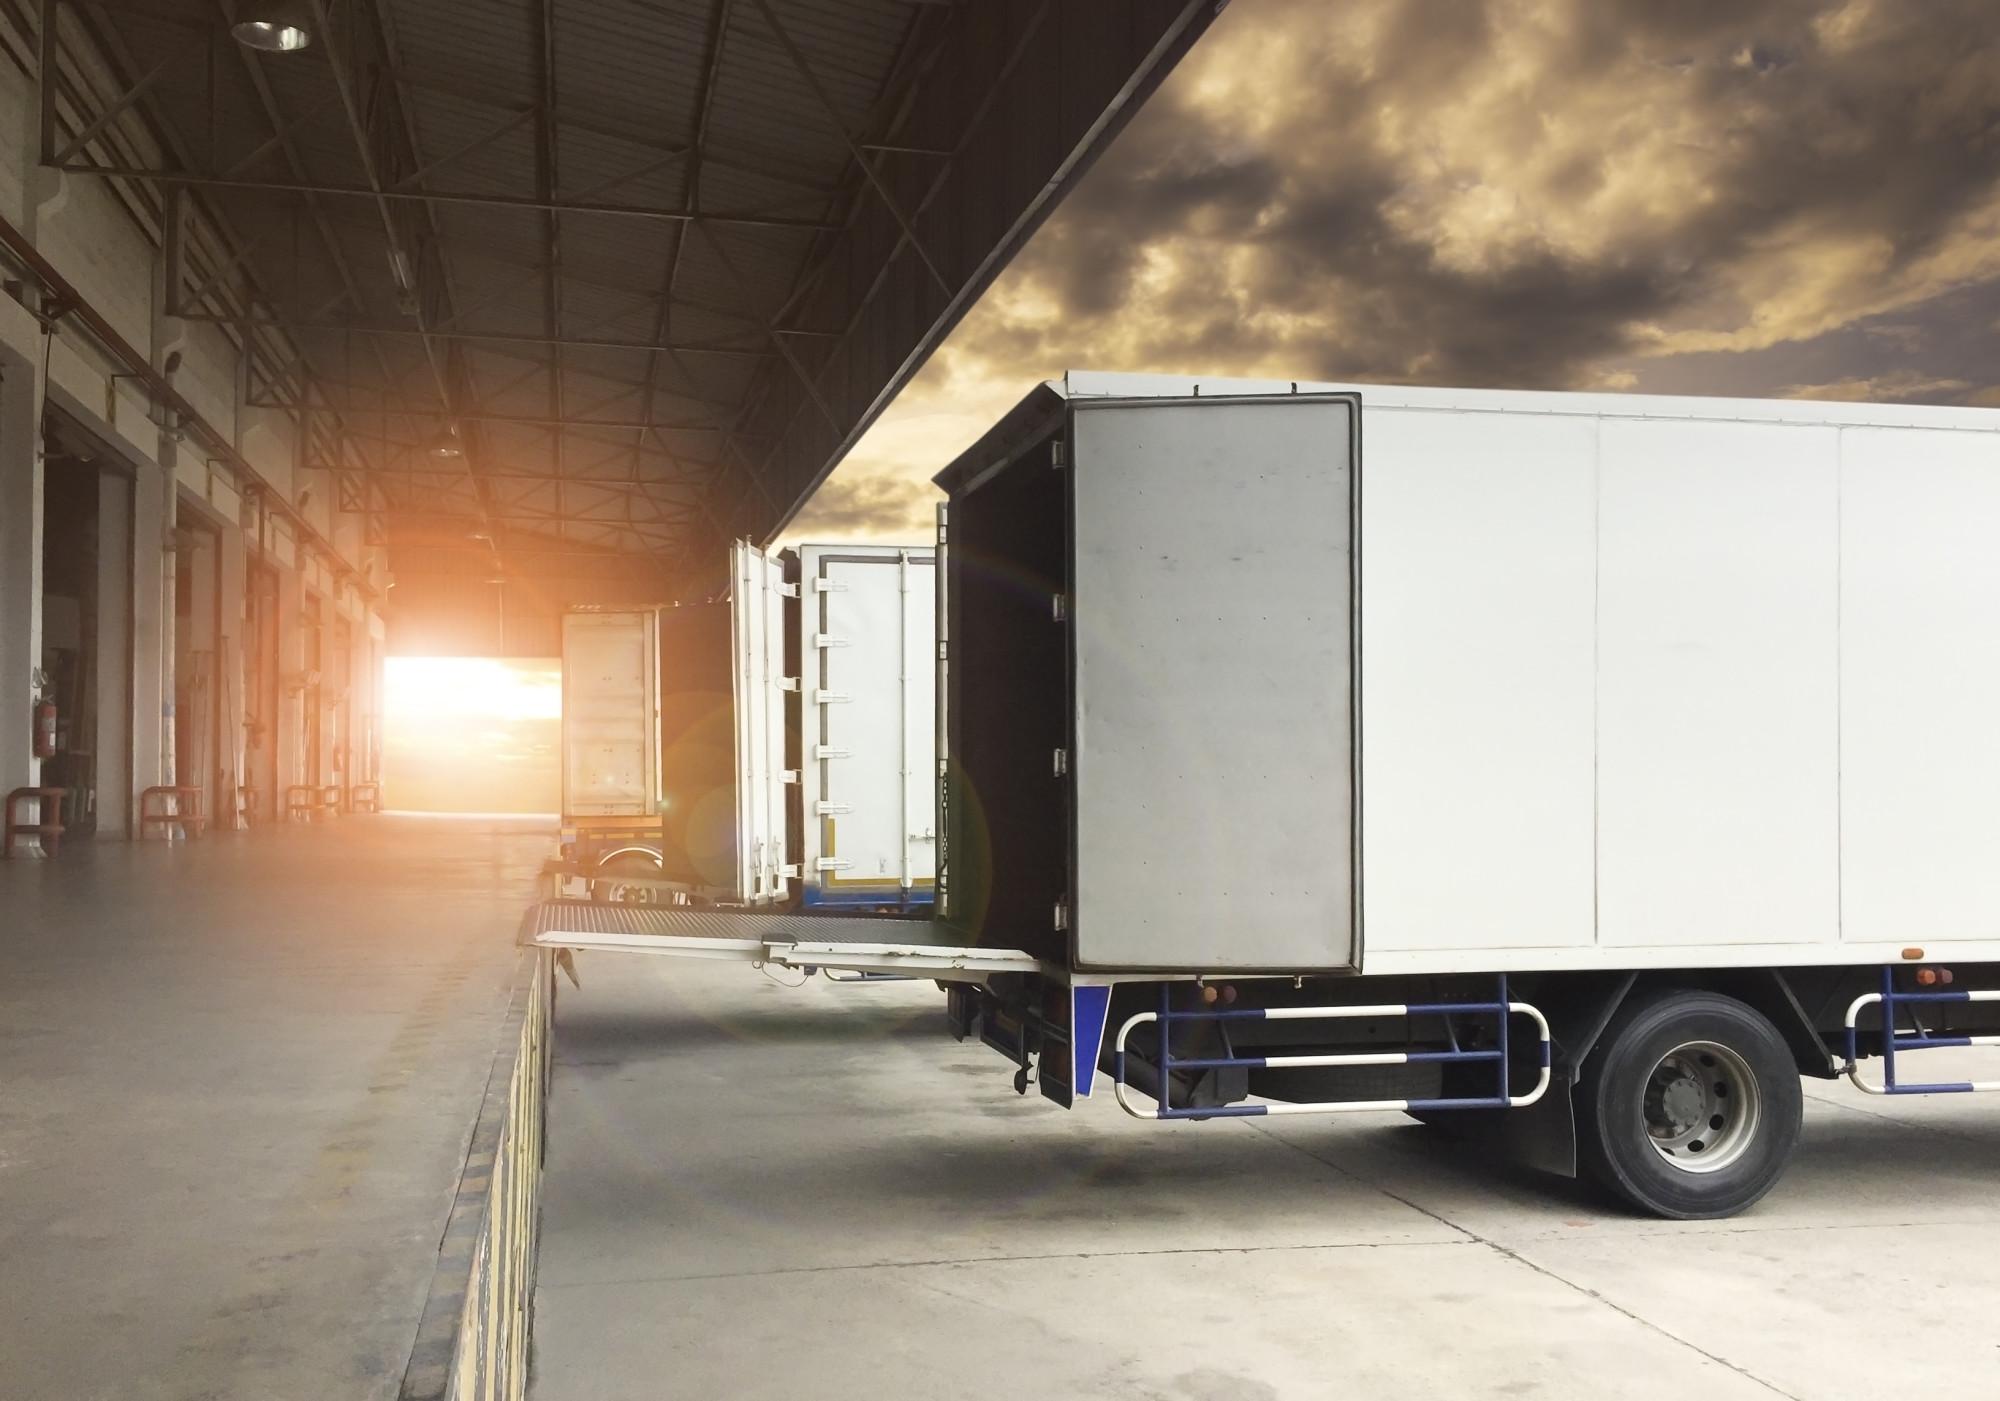 trailer at loading dock